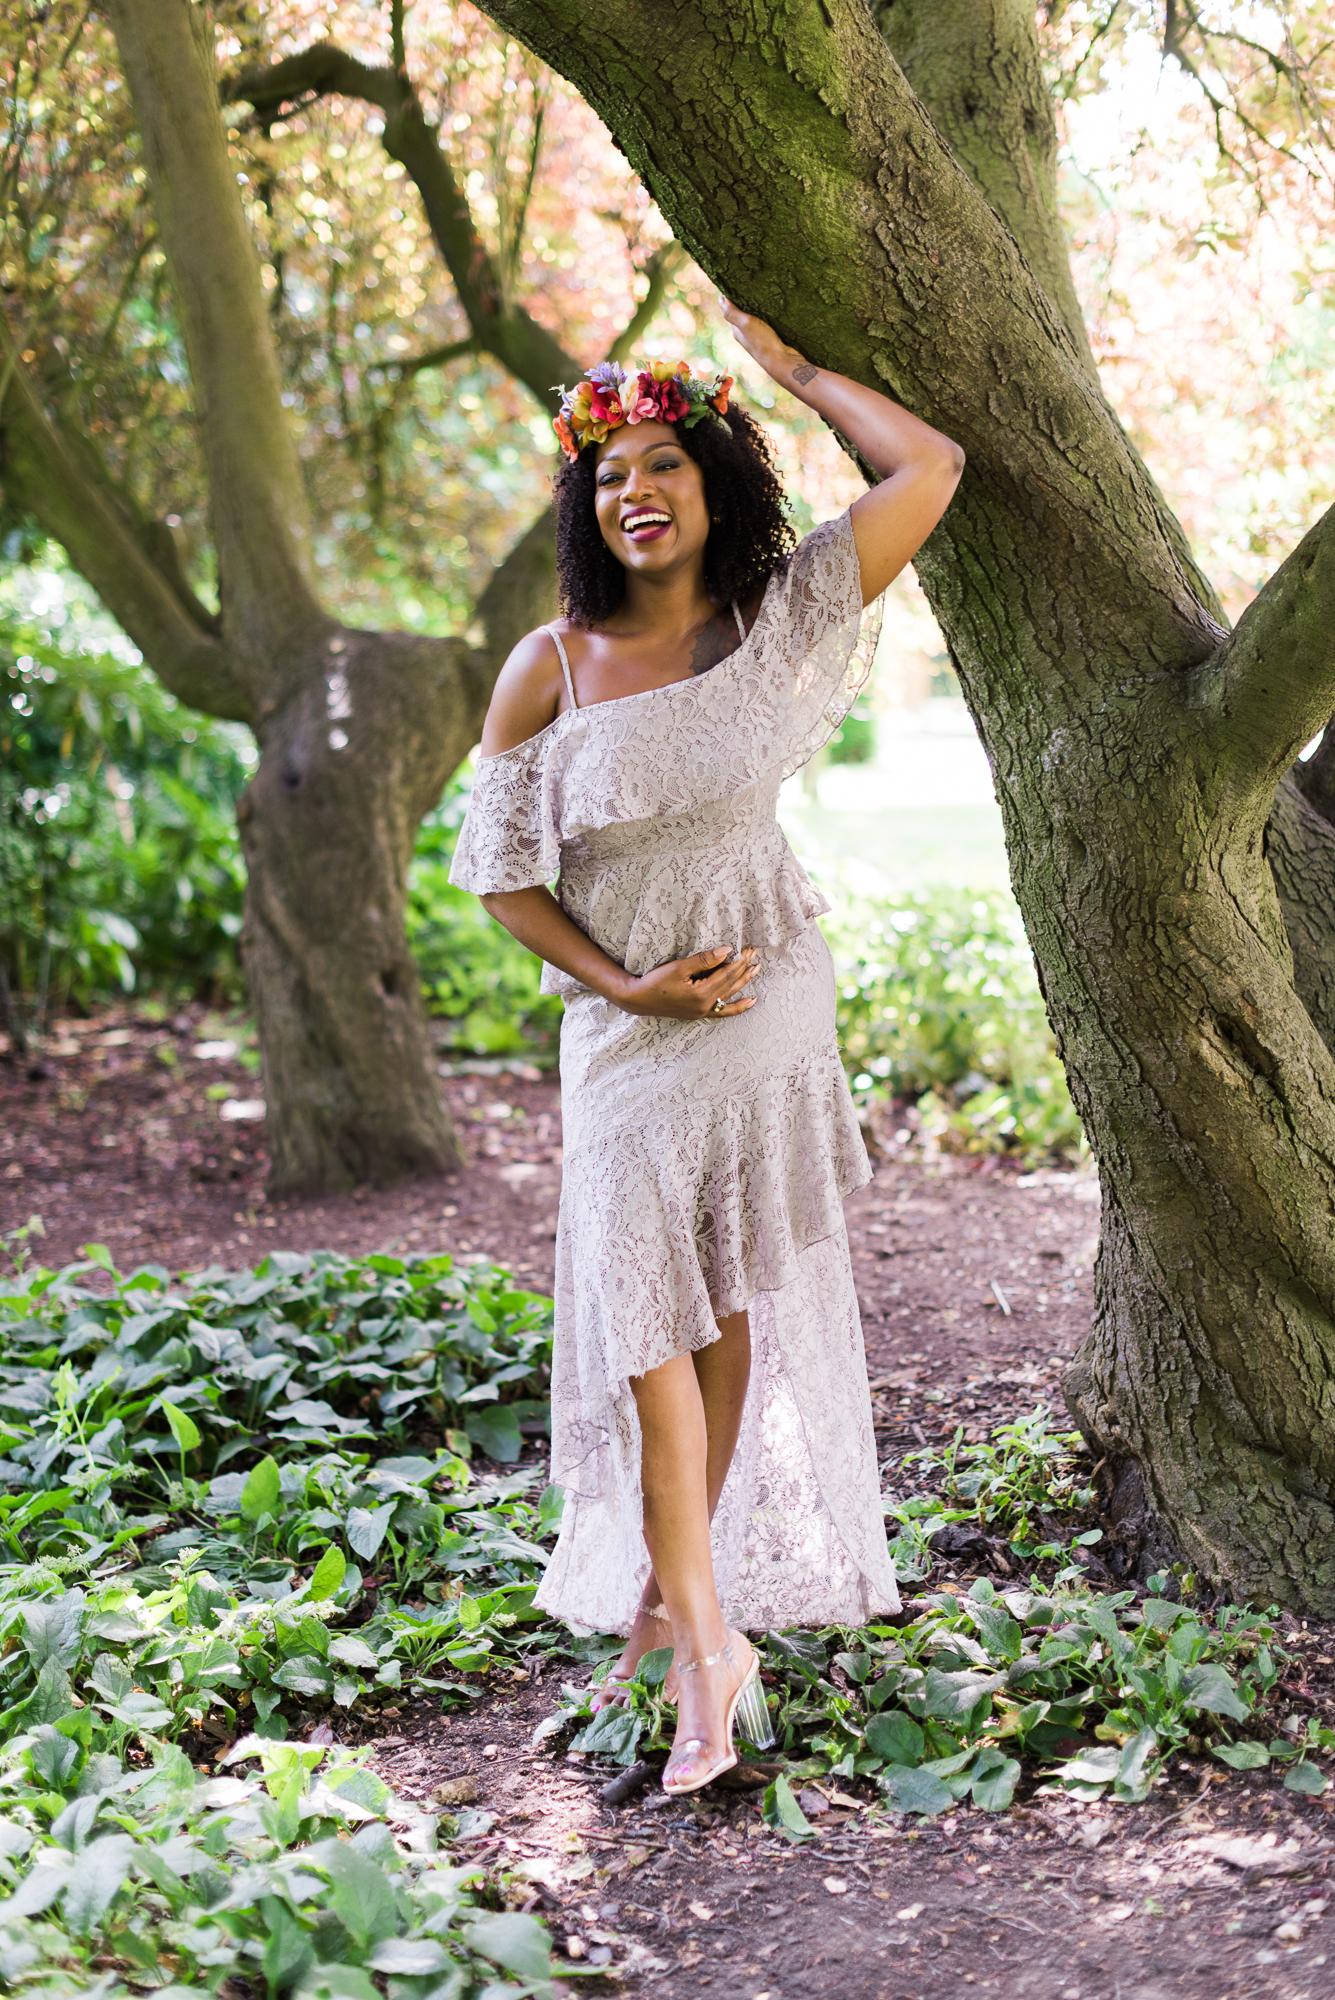 Joyce Oladipo Becky Rui Personal Branding Photographer-008.jpg